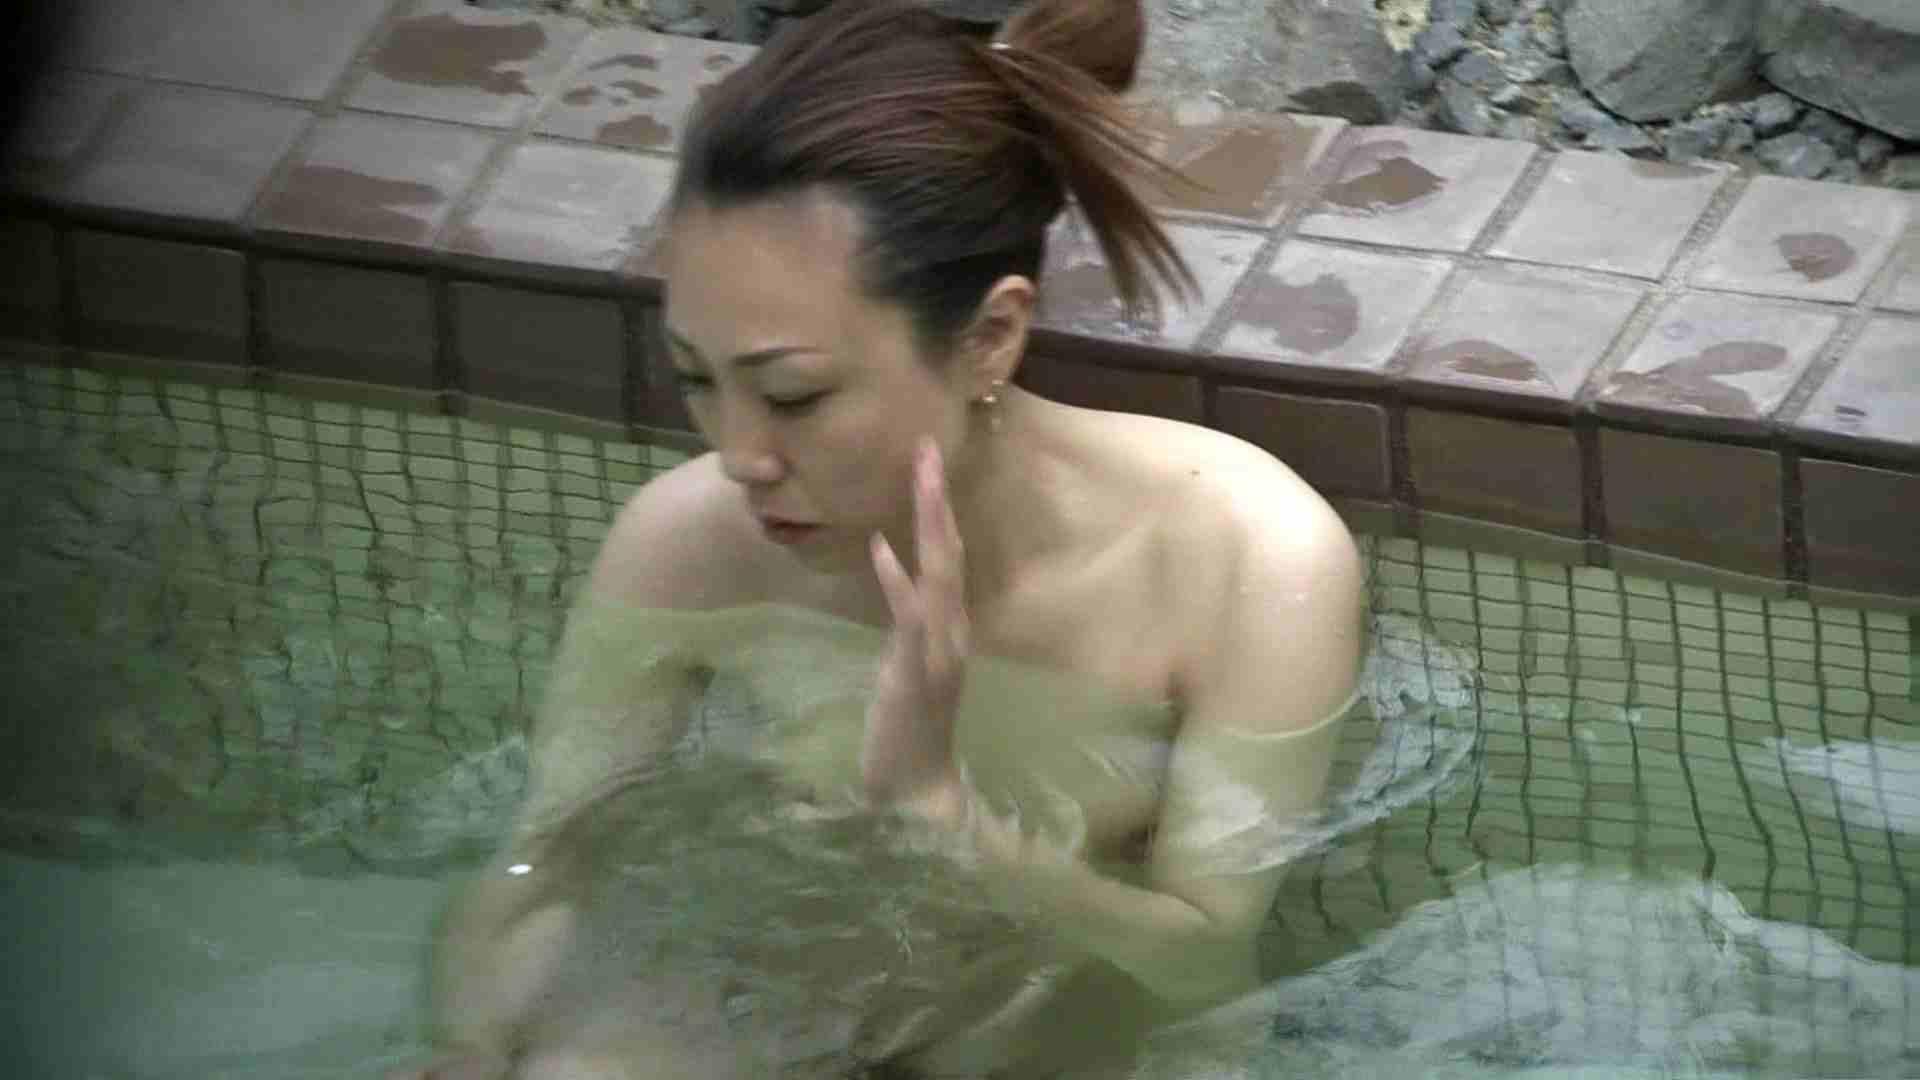 Aquaな露天風呂Vol.654 HなOL | 盗撮  60pic 54